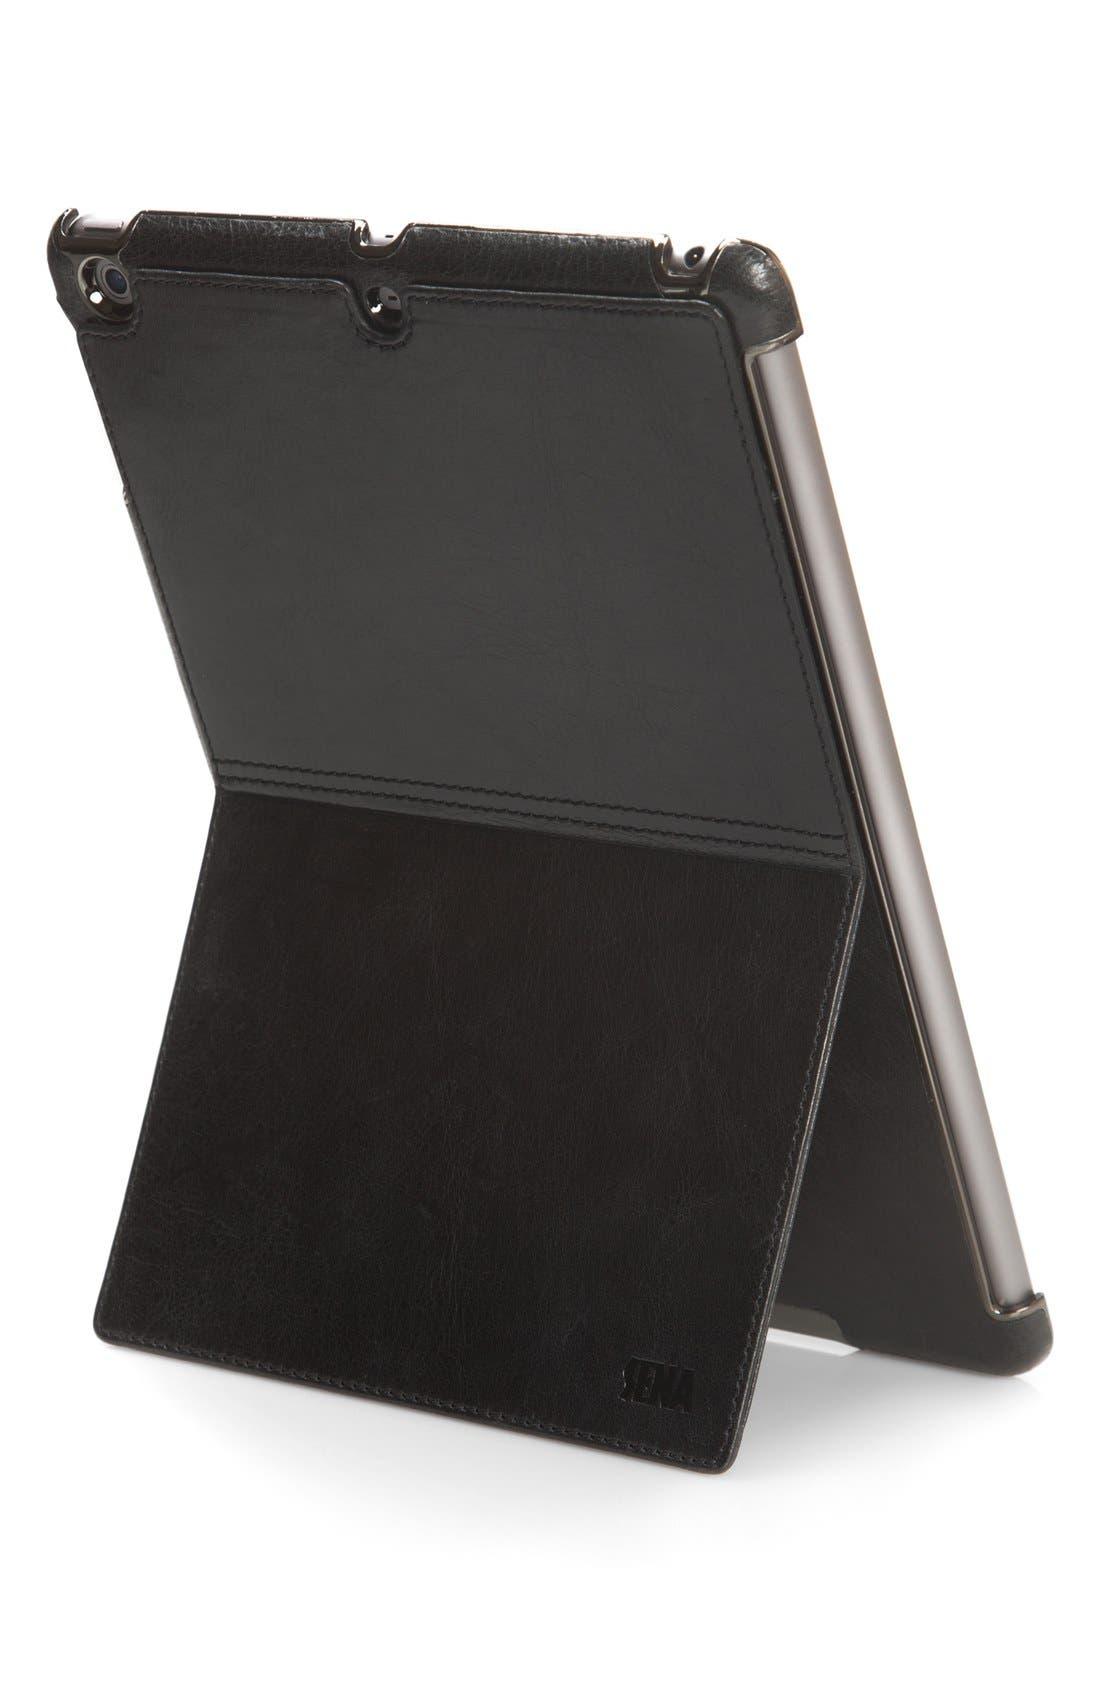 'Heritage' iPad Air Stand,                             Main thumbnail 1, color,                             005